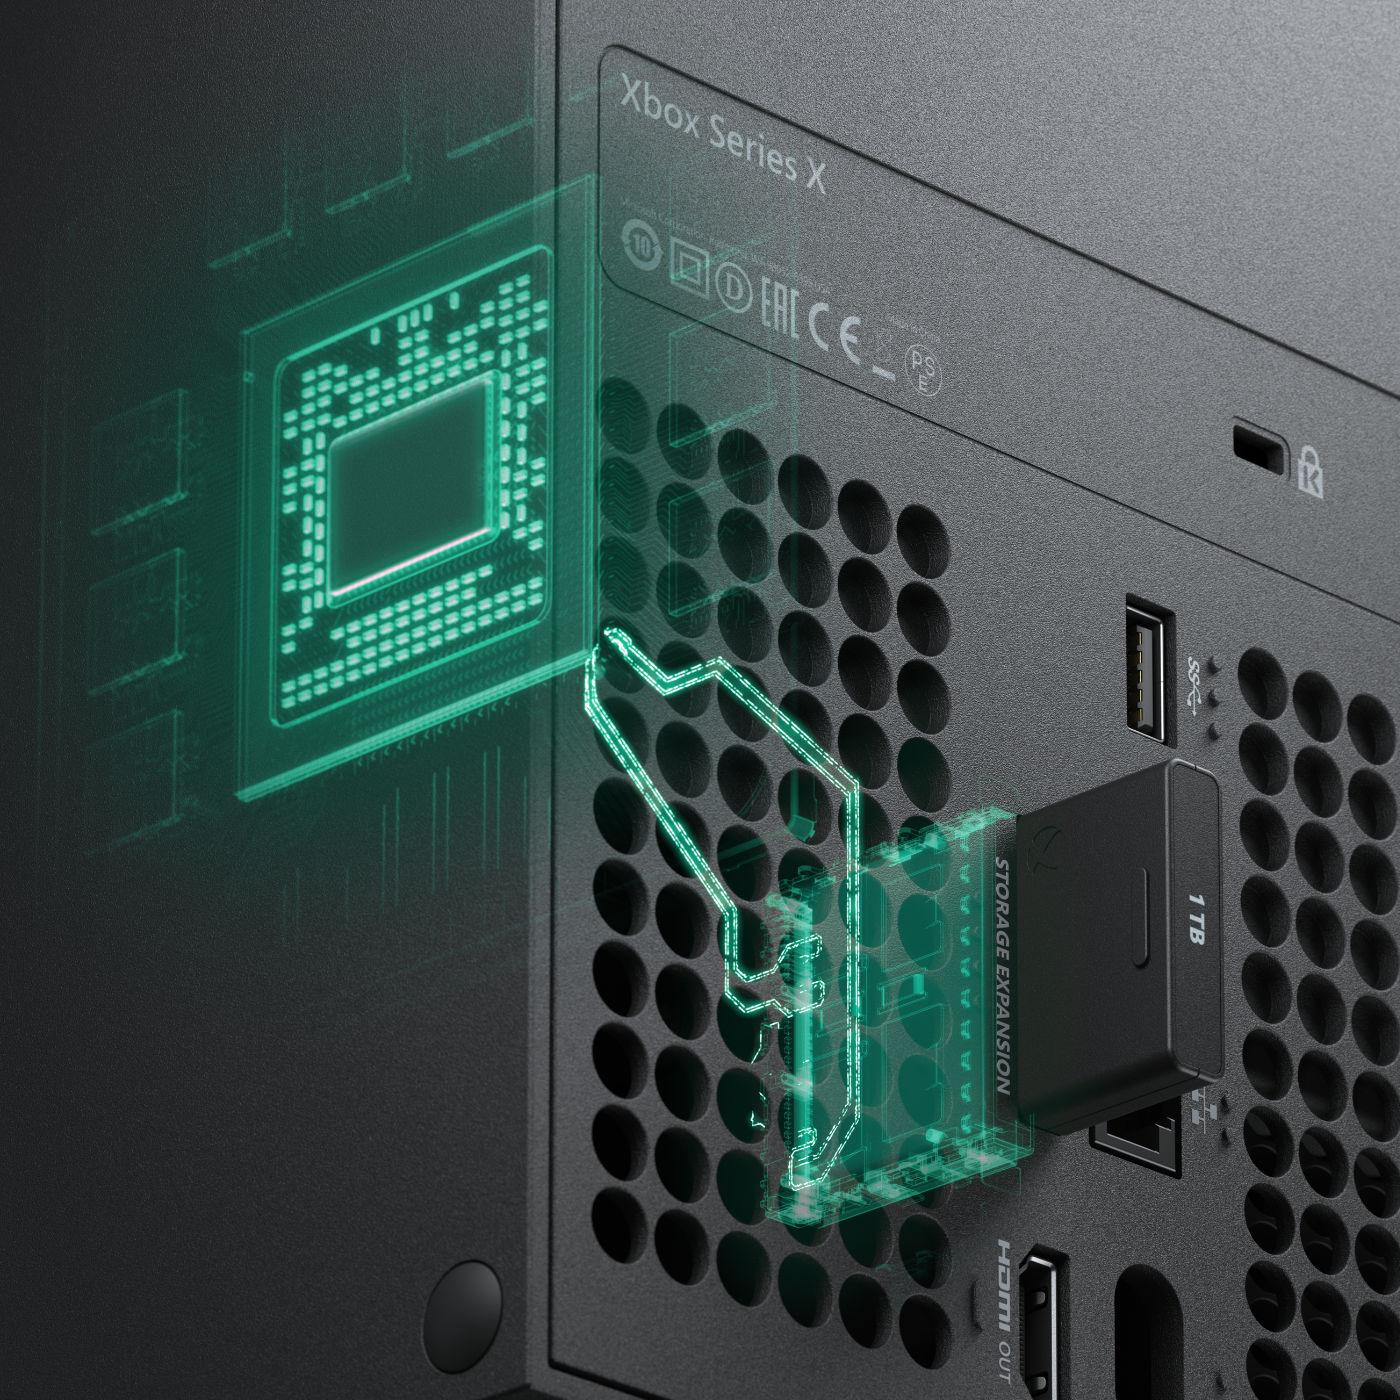 Xbox Series Xのスペック公開、専用メモリカードもあるけどUSBの外付けSSDでプレイ可能